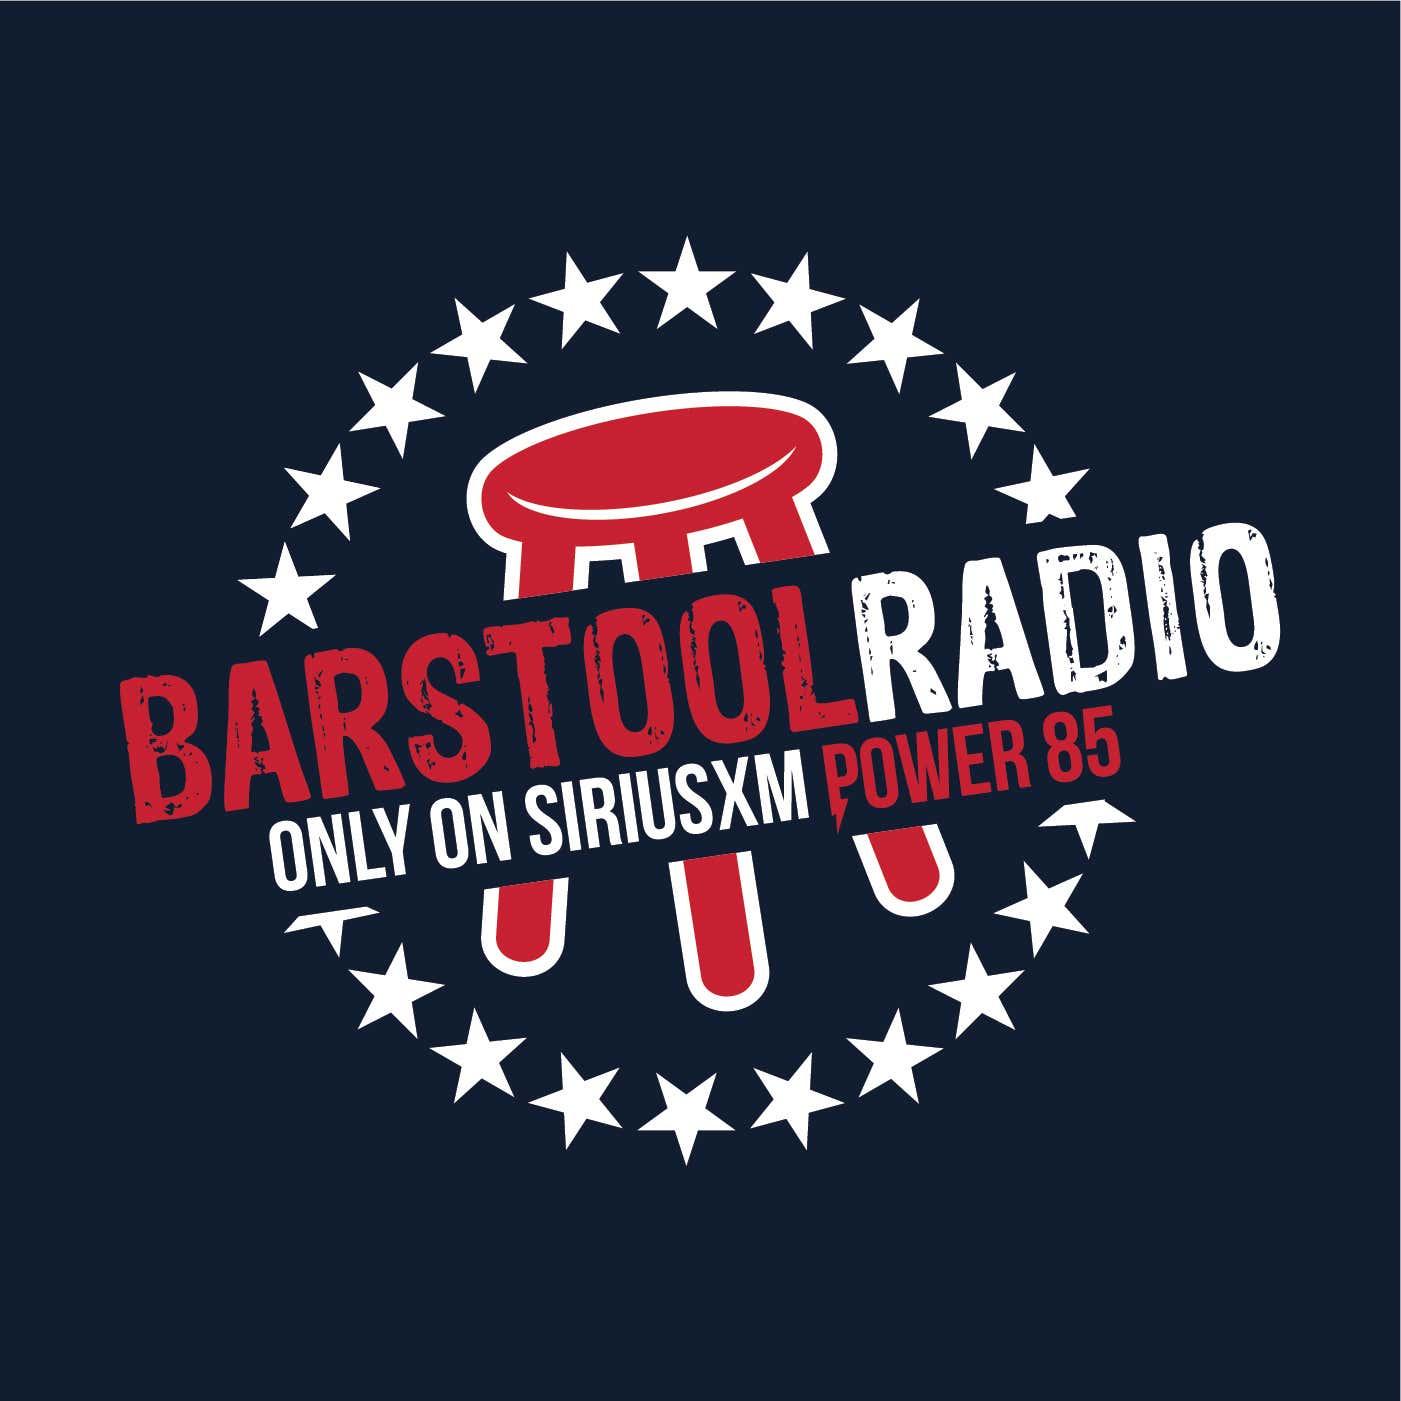 Best of Barstool Radio